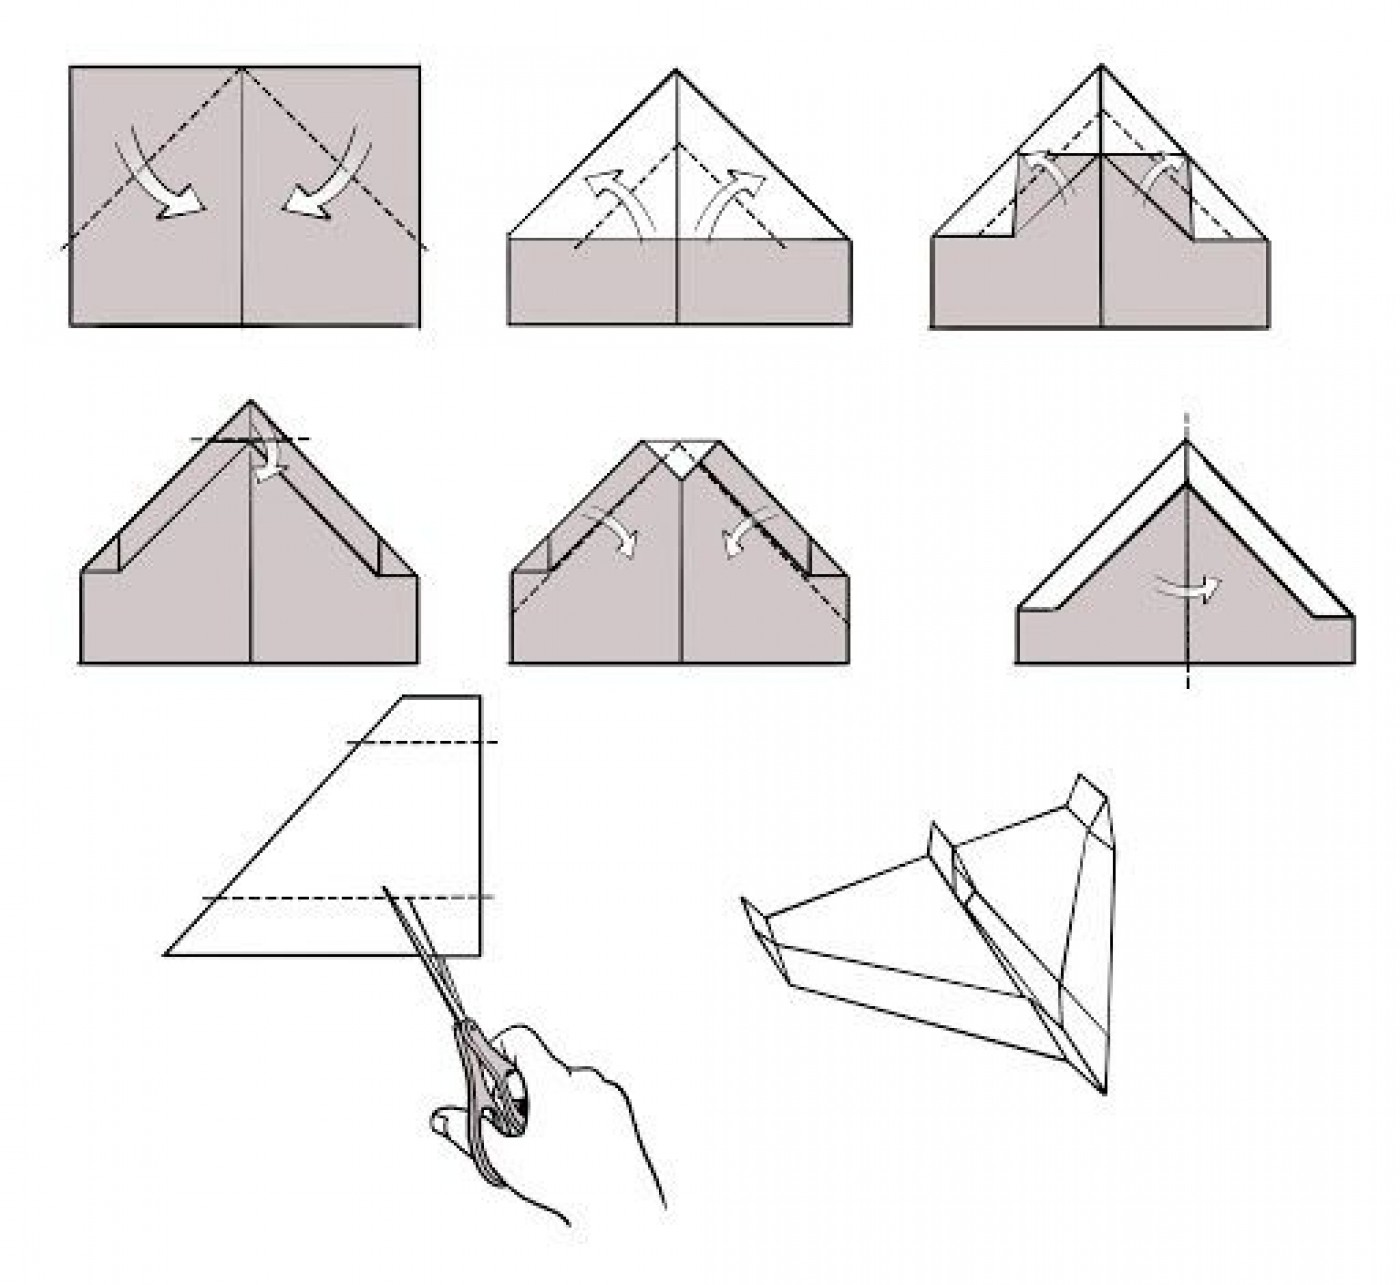 009 Awesome Printable Paper Plane Plan Photo  Free Airplane Template Pdf1400